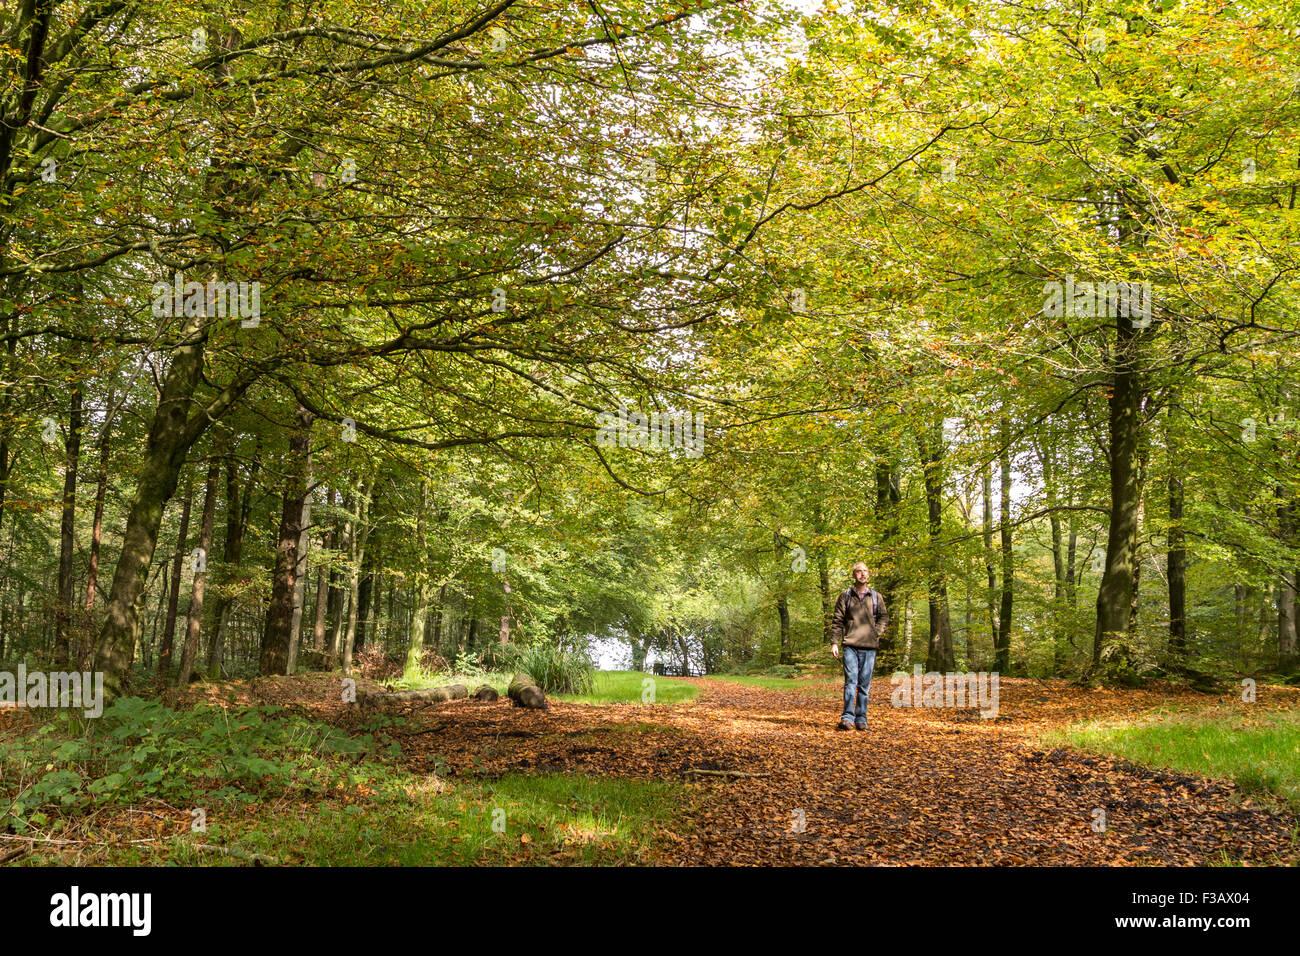 Beech Leaf Autumn Uk Stock Photos & Beech Leaf Autumn Uk Stock ...